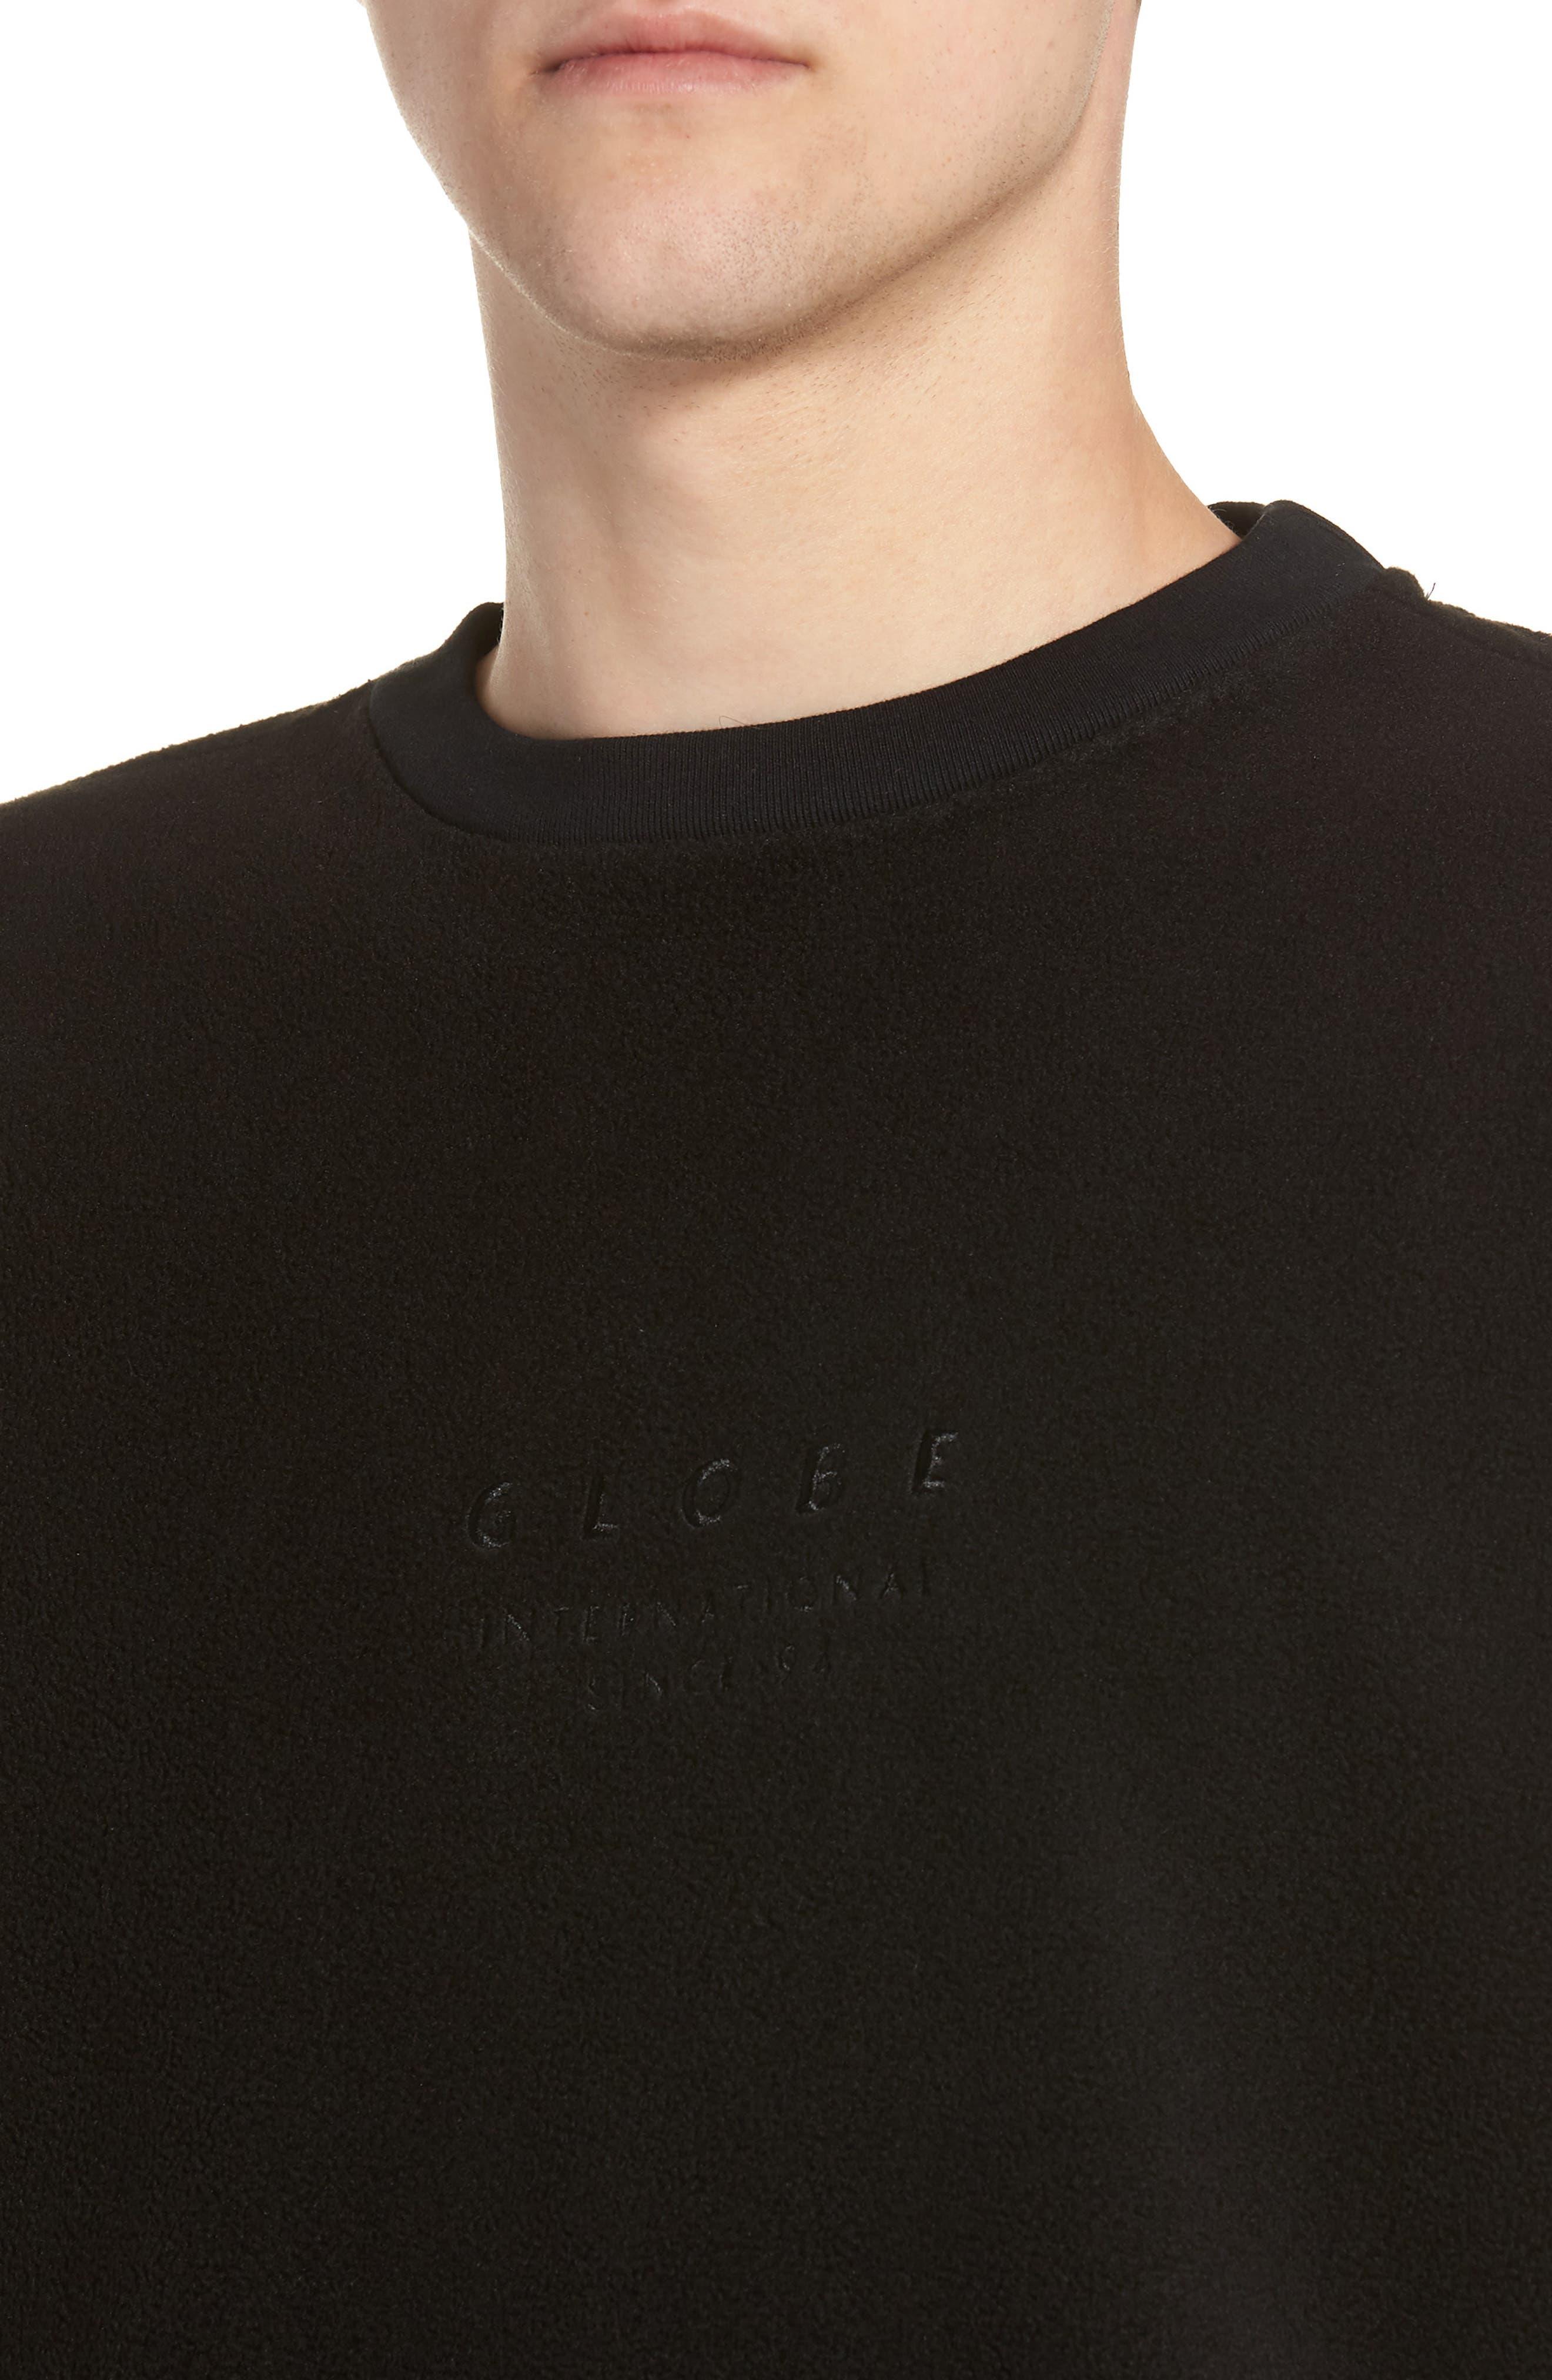 State Sweatshirt,                             Alternate thumbnail 4, color,                             BLACK